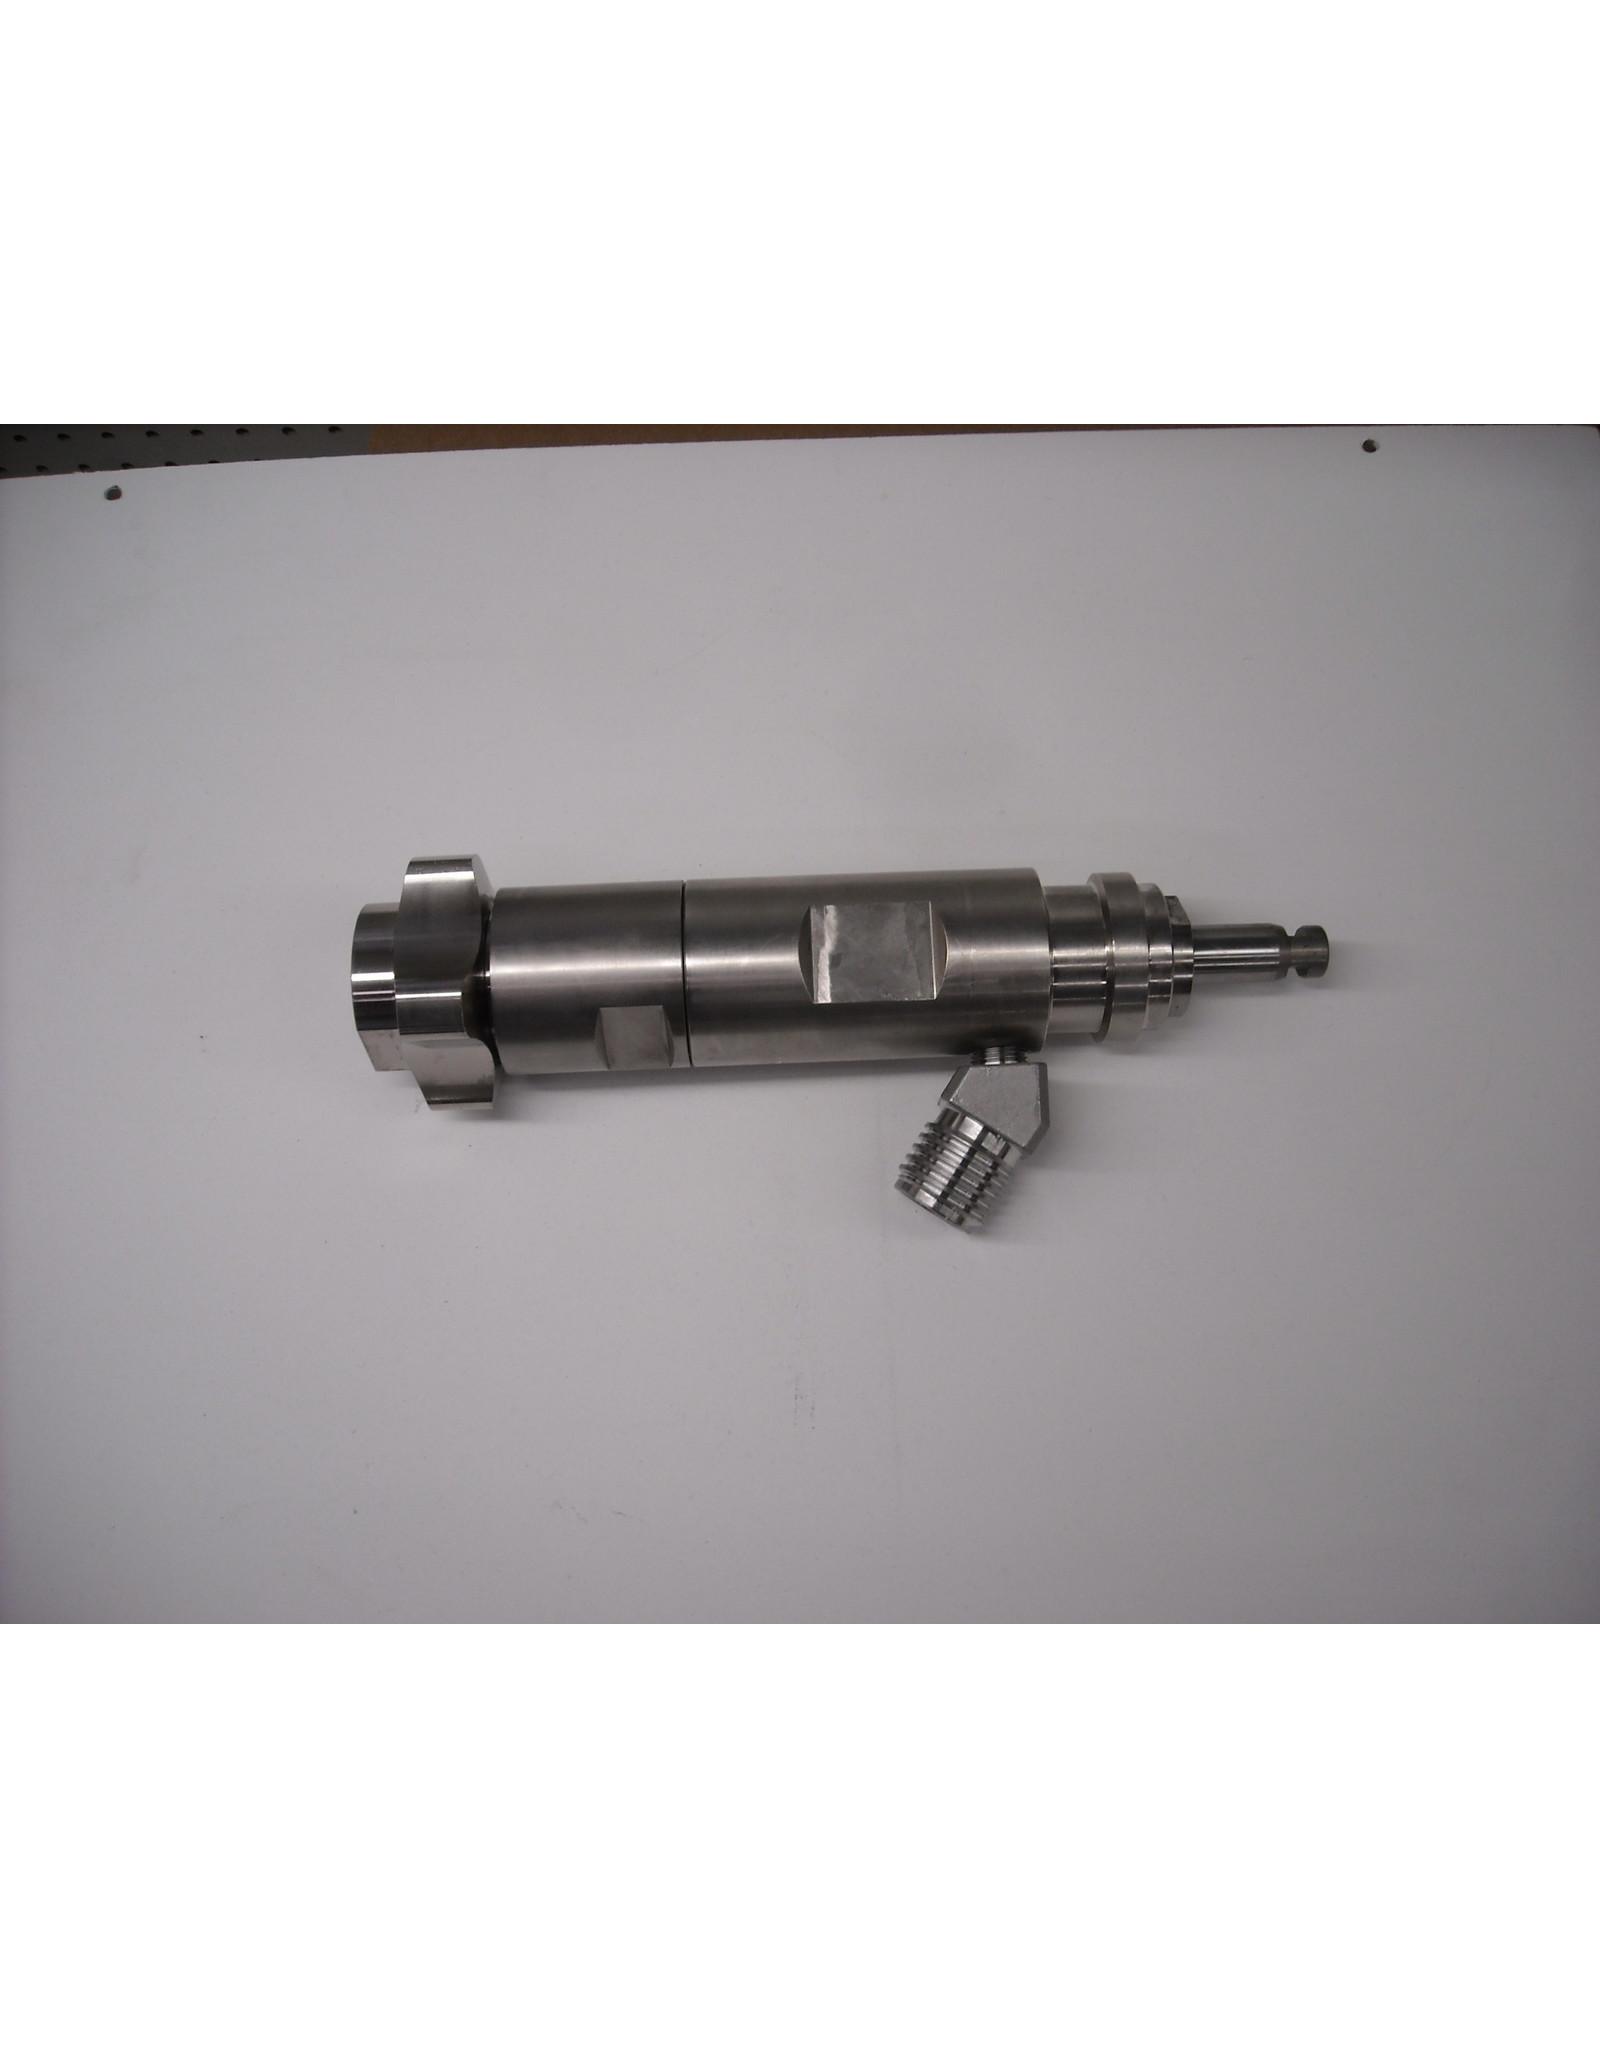 Titan 805-246A Impact 1140 Fluid Pump Assembly